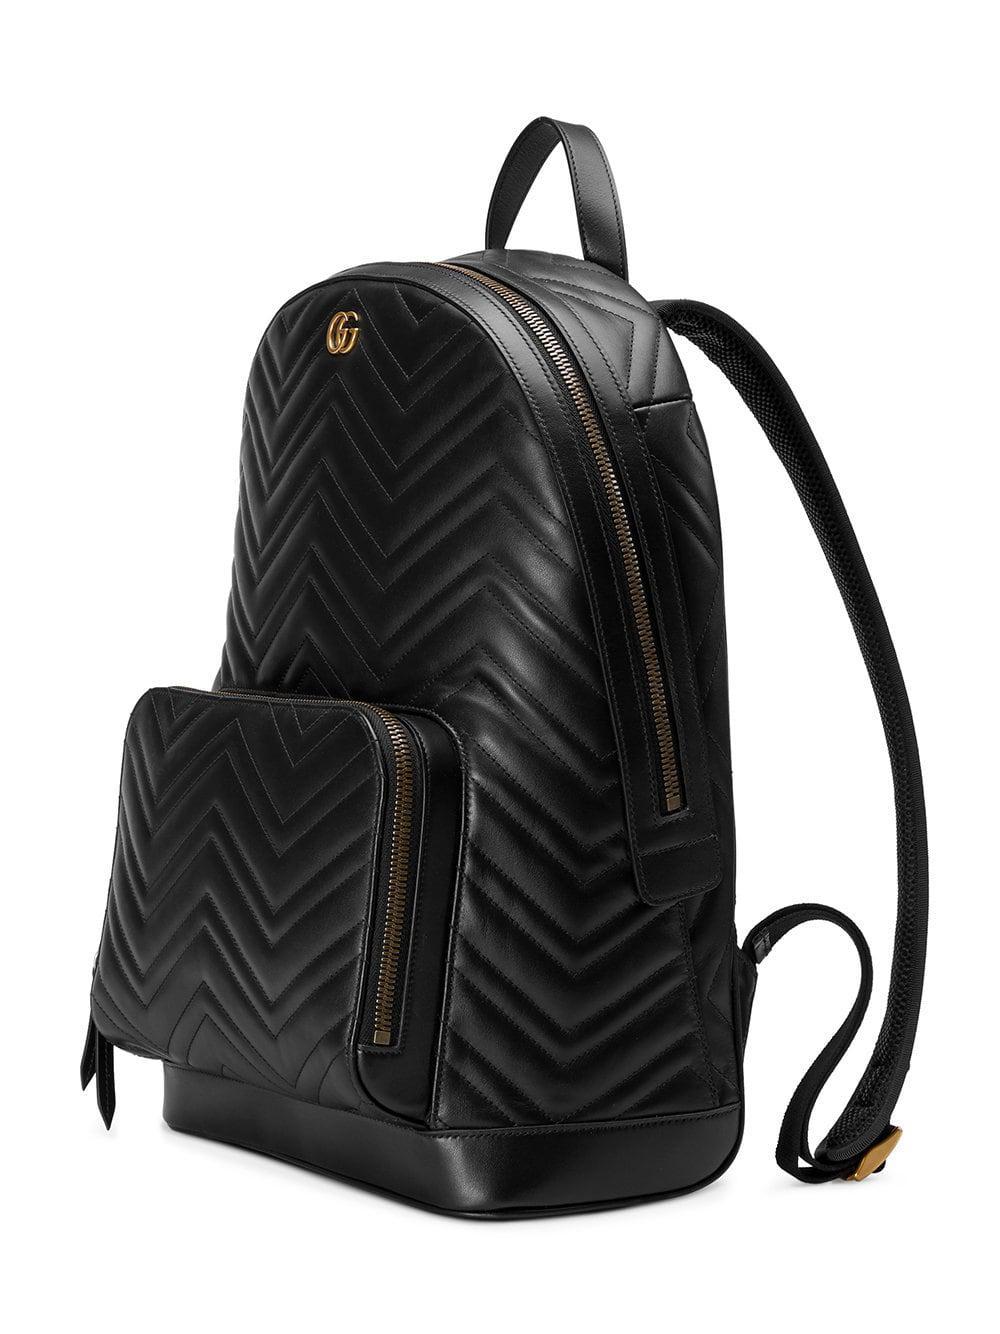 38005a9e7d47 Gucci - Black GG Marmont Matelassé Backpack for Men - Lyst. View fullscreen